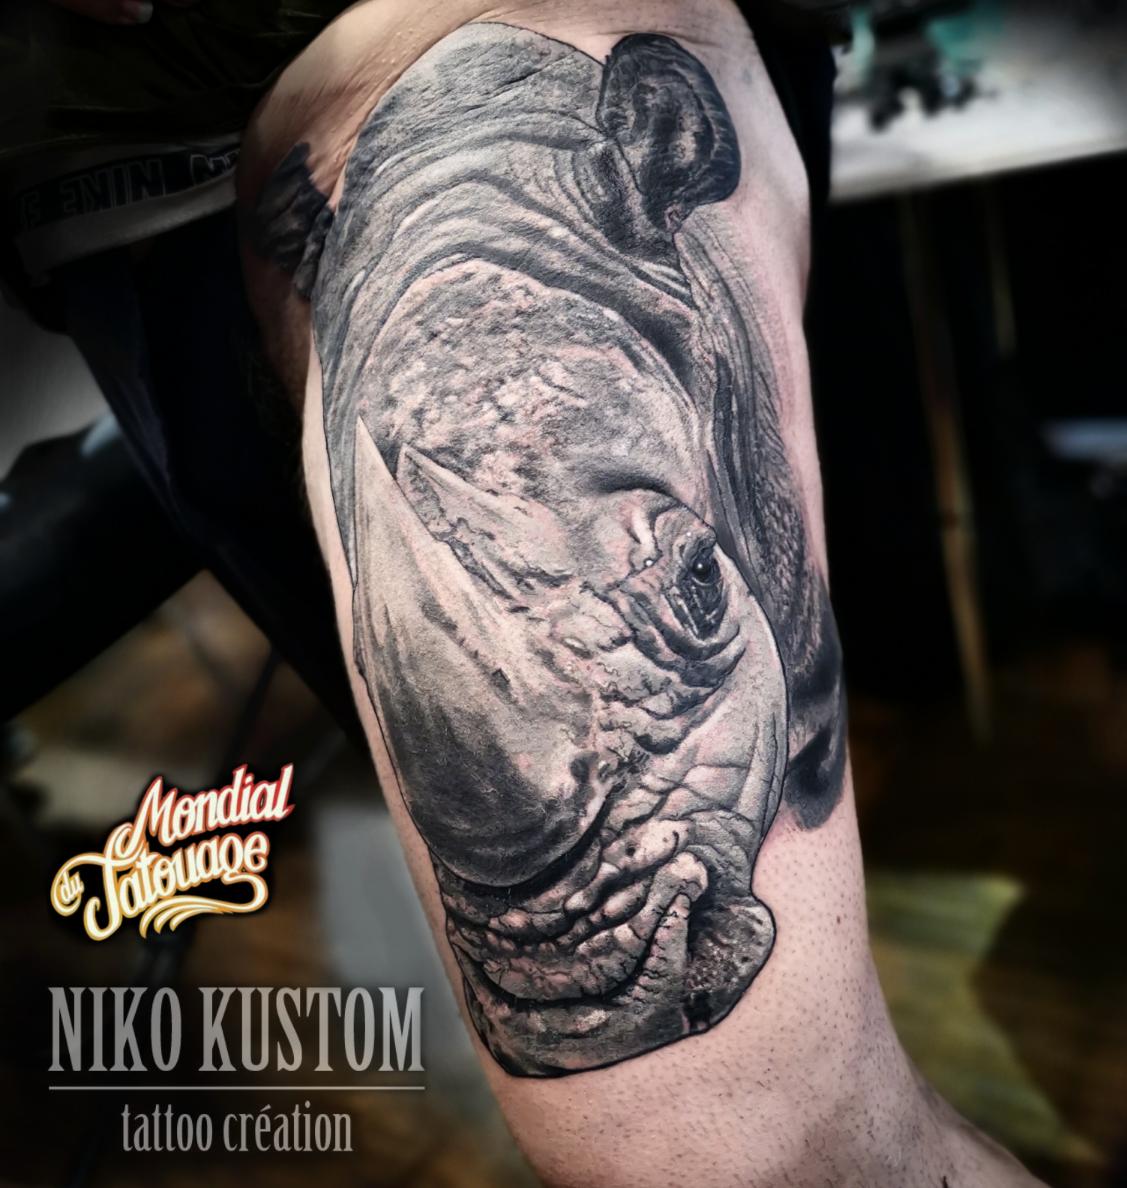 Mondial du tatouage 2019 , Paris Tattoo convention